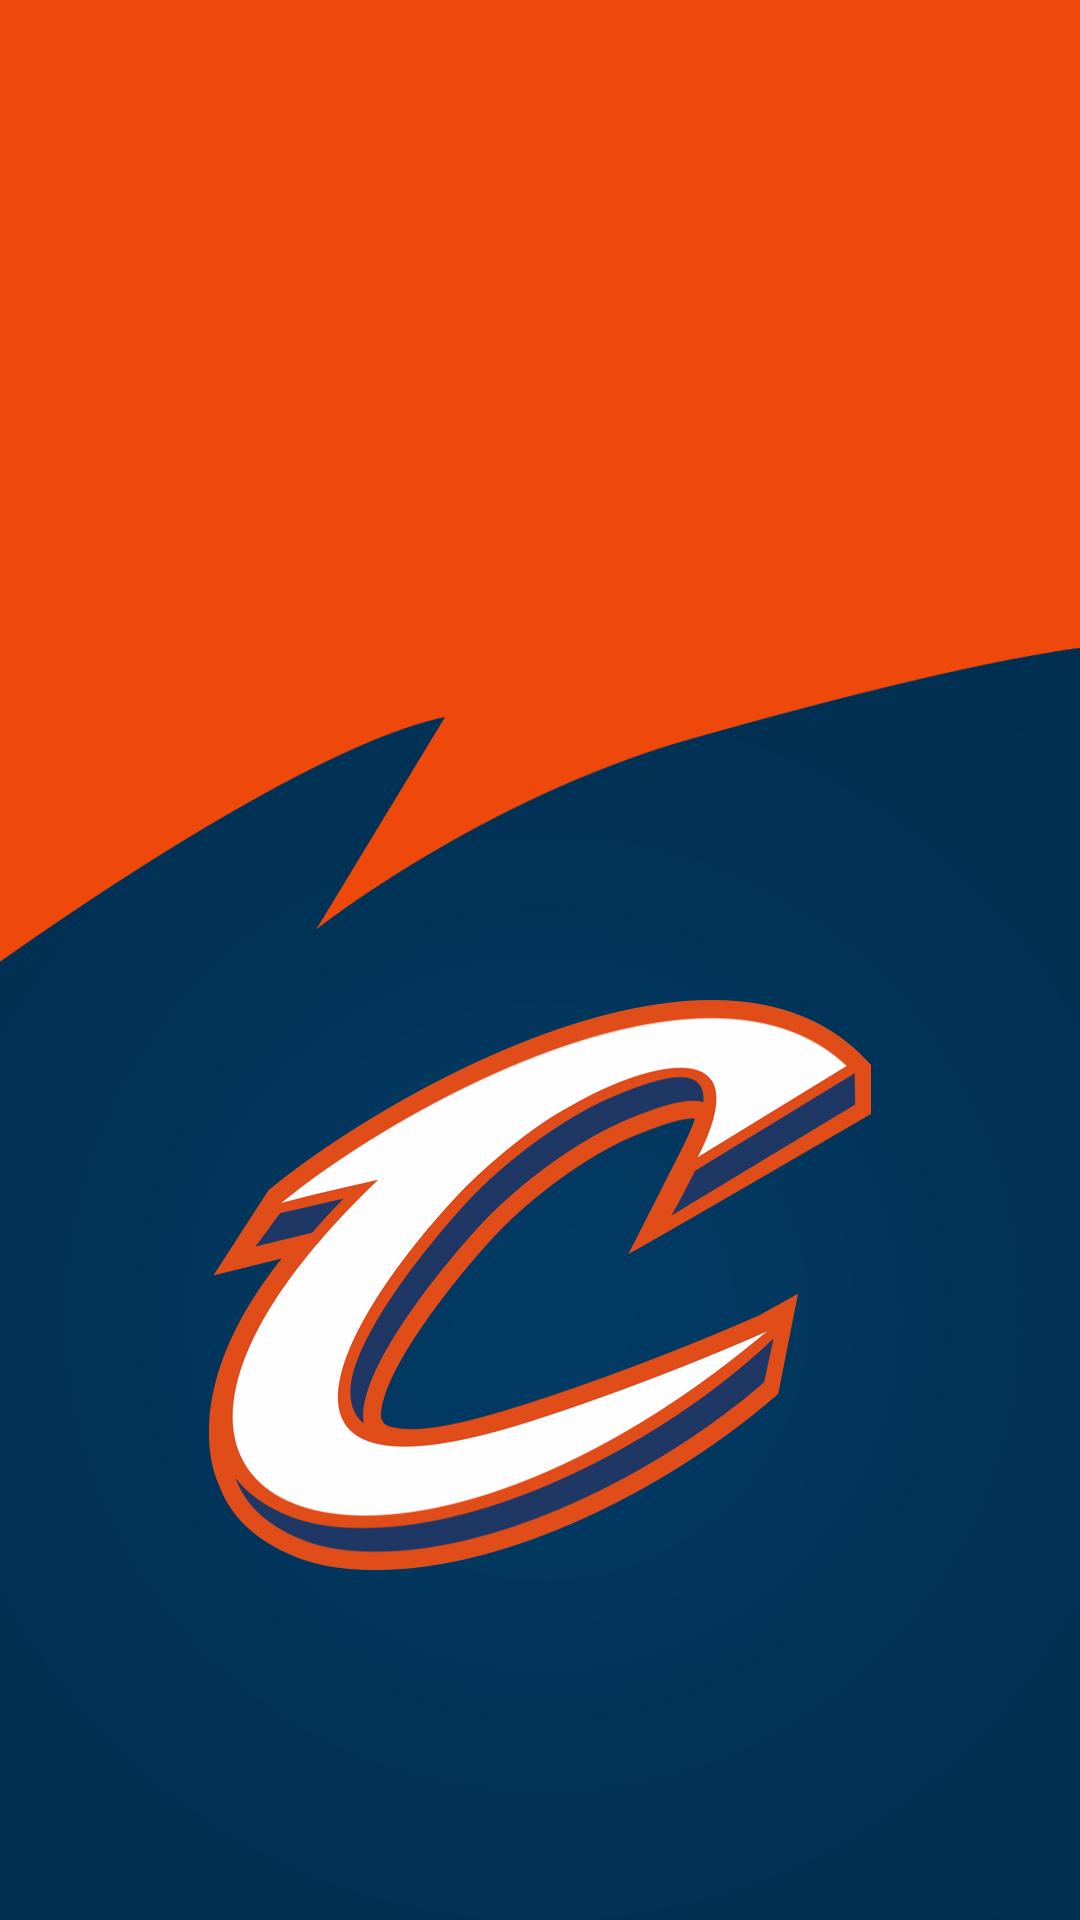 c3b5bef245b 2018-2019 Cleveland City Edition Uniform | Cleveland Cavaliers